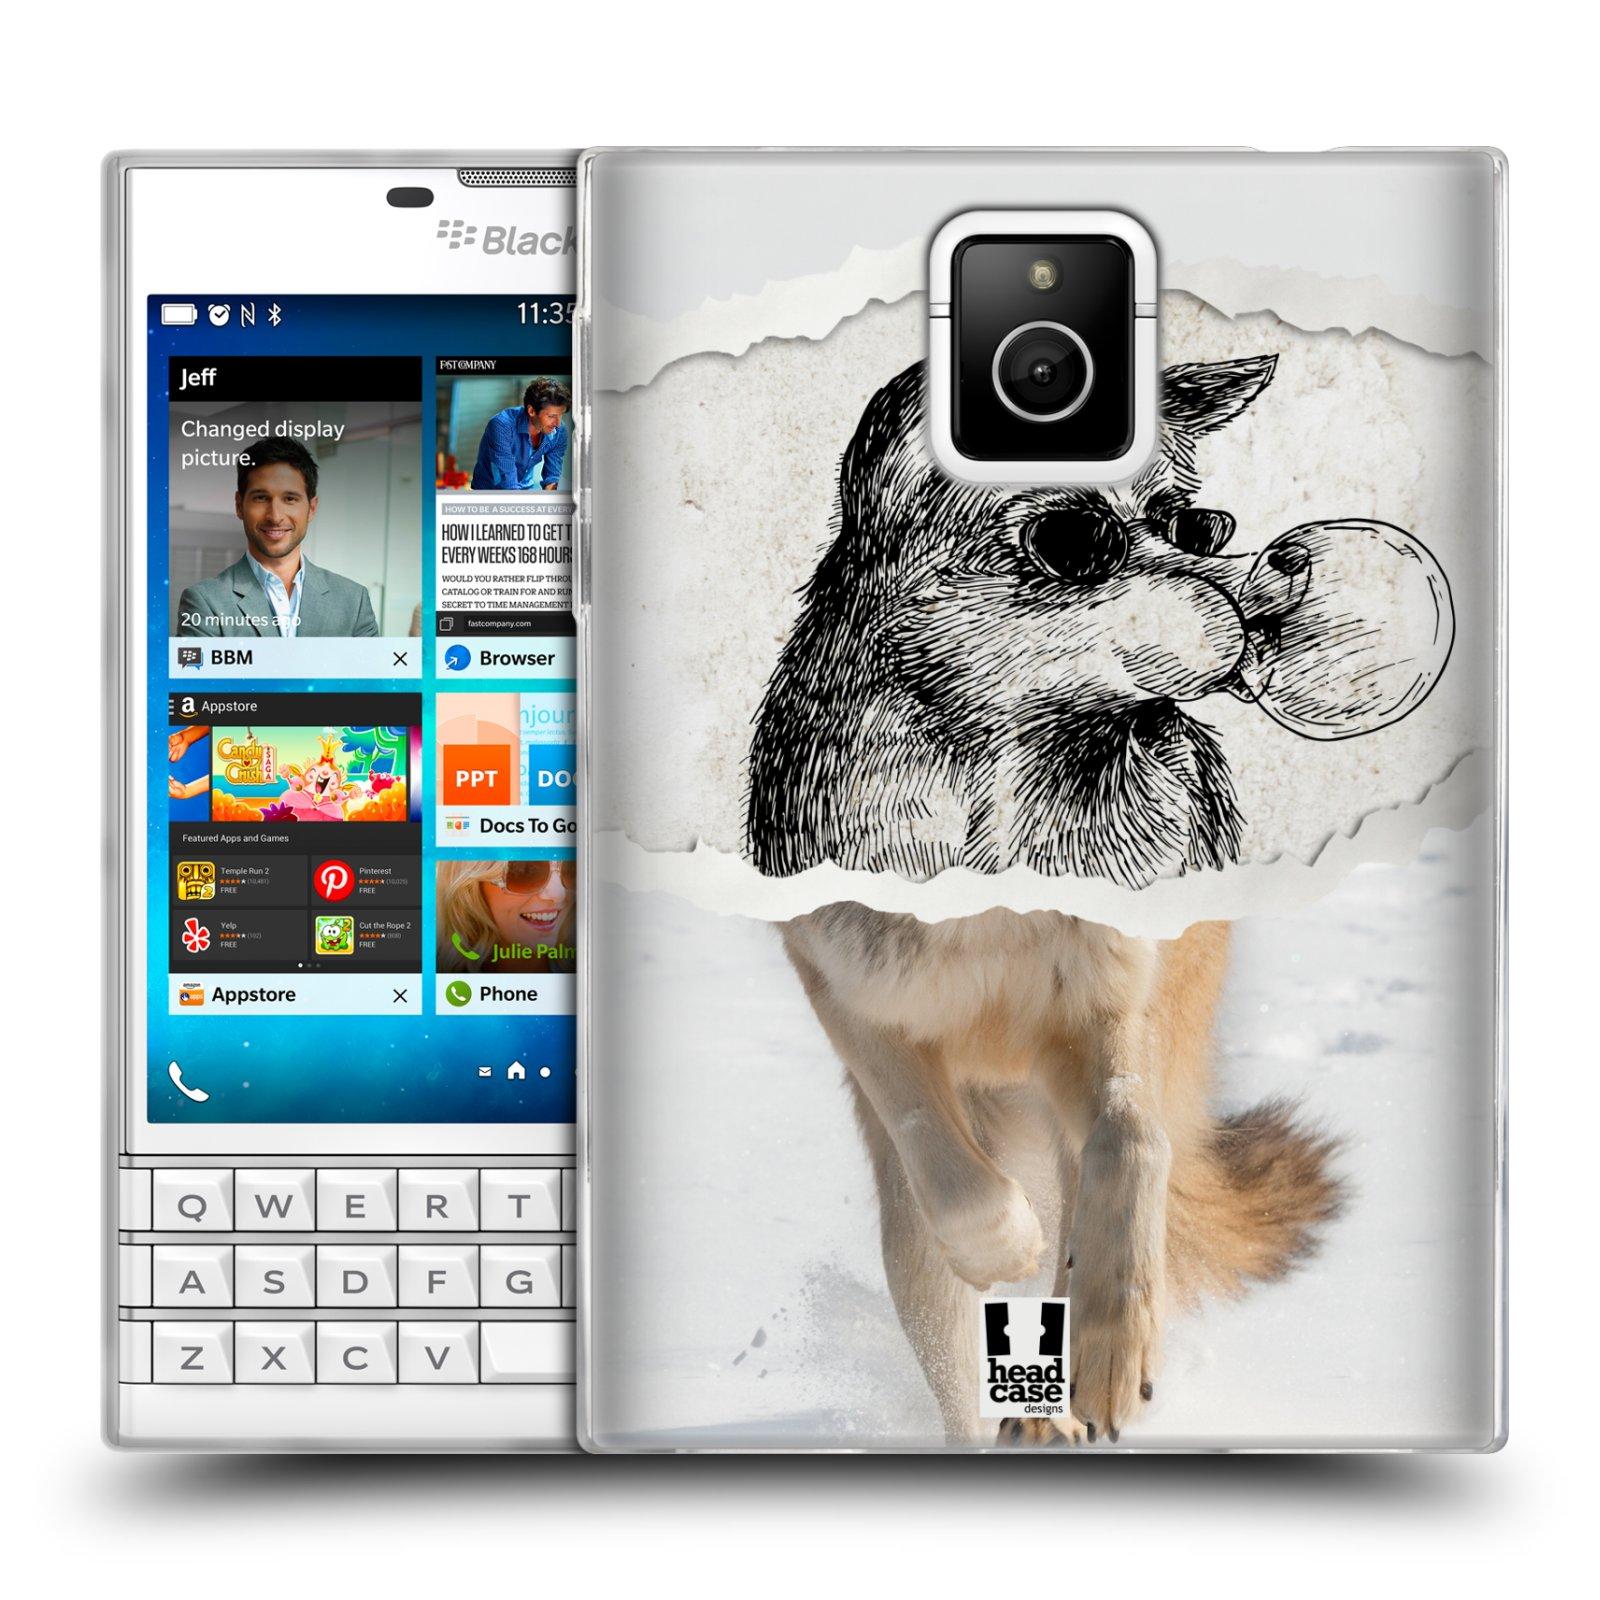 HEAD CASE silikonový obal na mobil Blackberry PASSPORT vzor zvířata koláž vlk pohodář